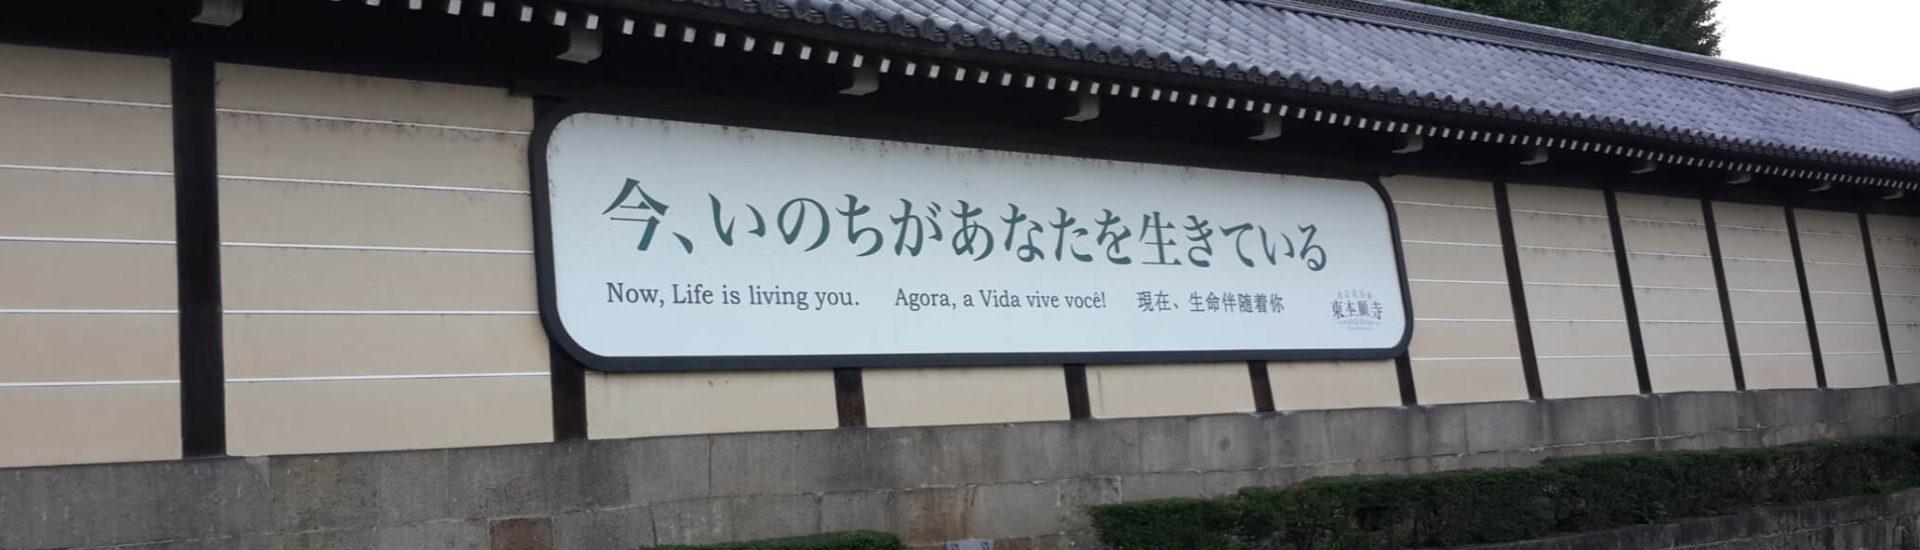 Ahora la vida te vive. Kyoto